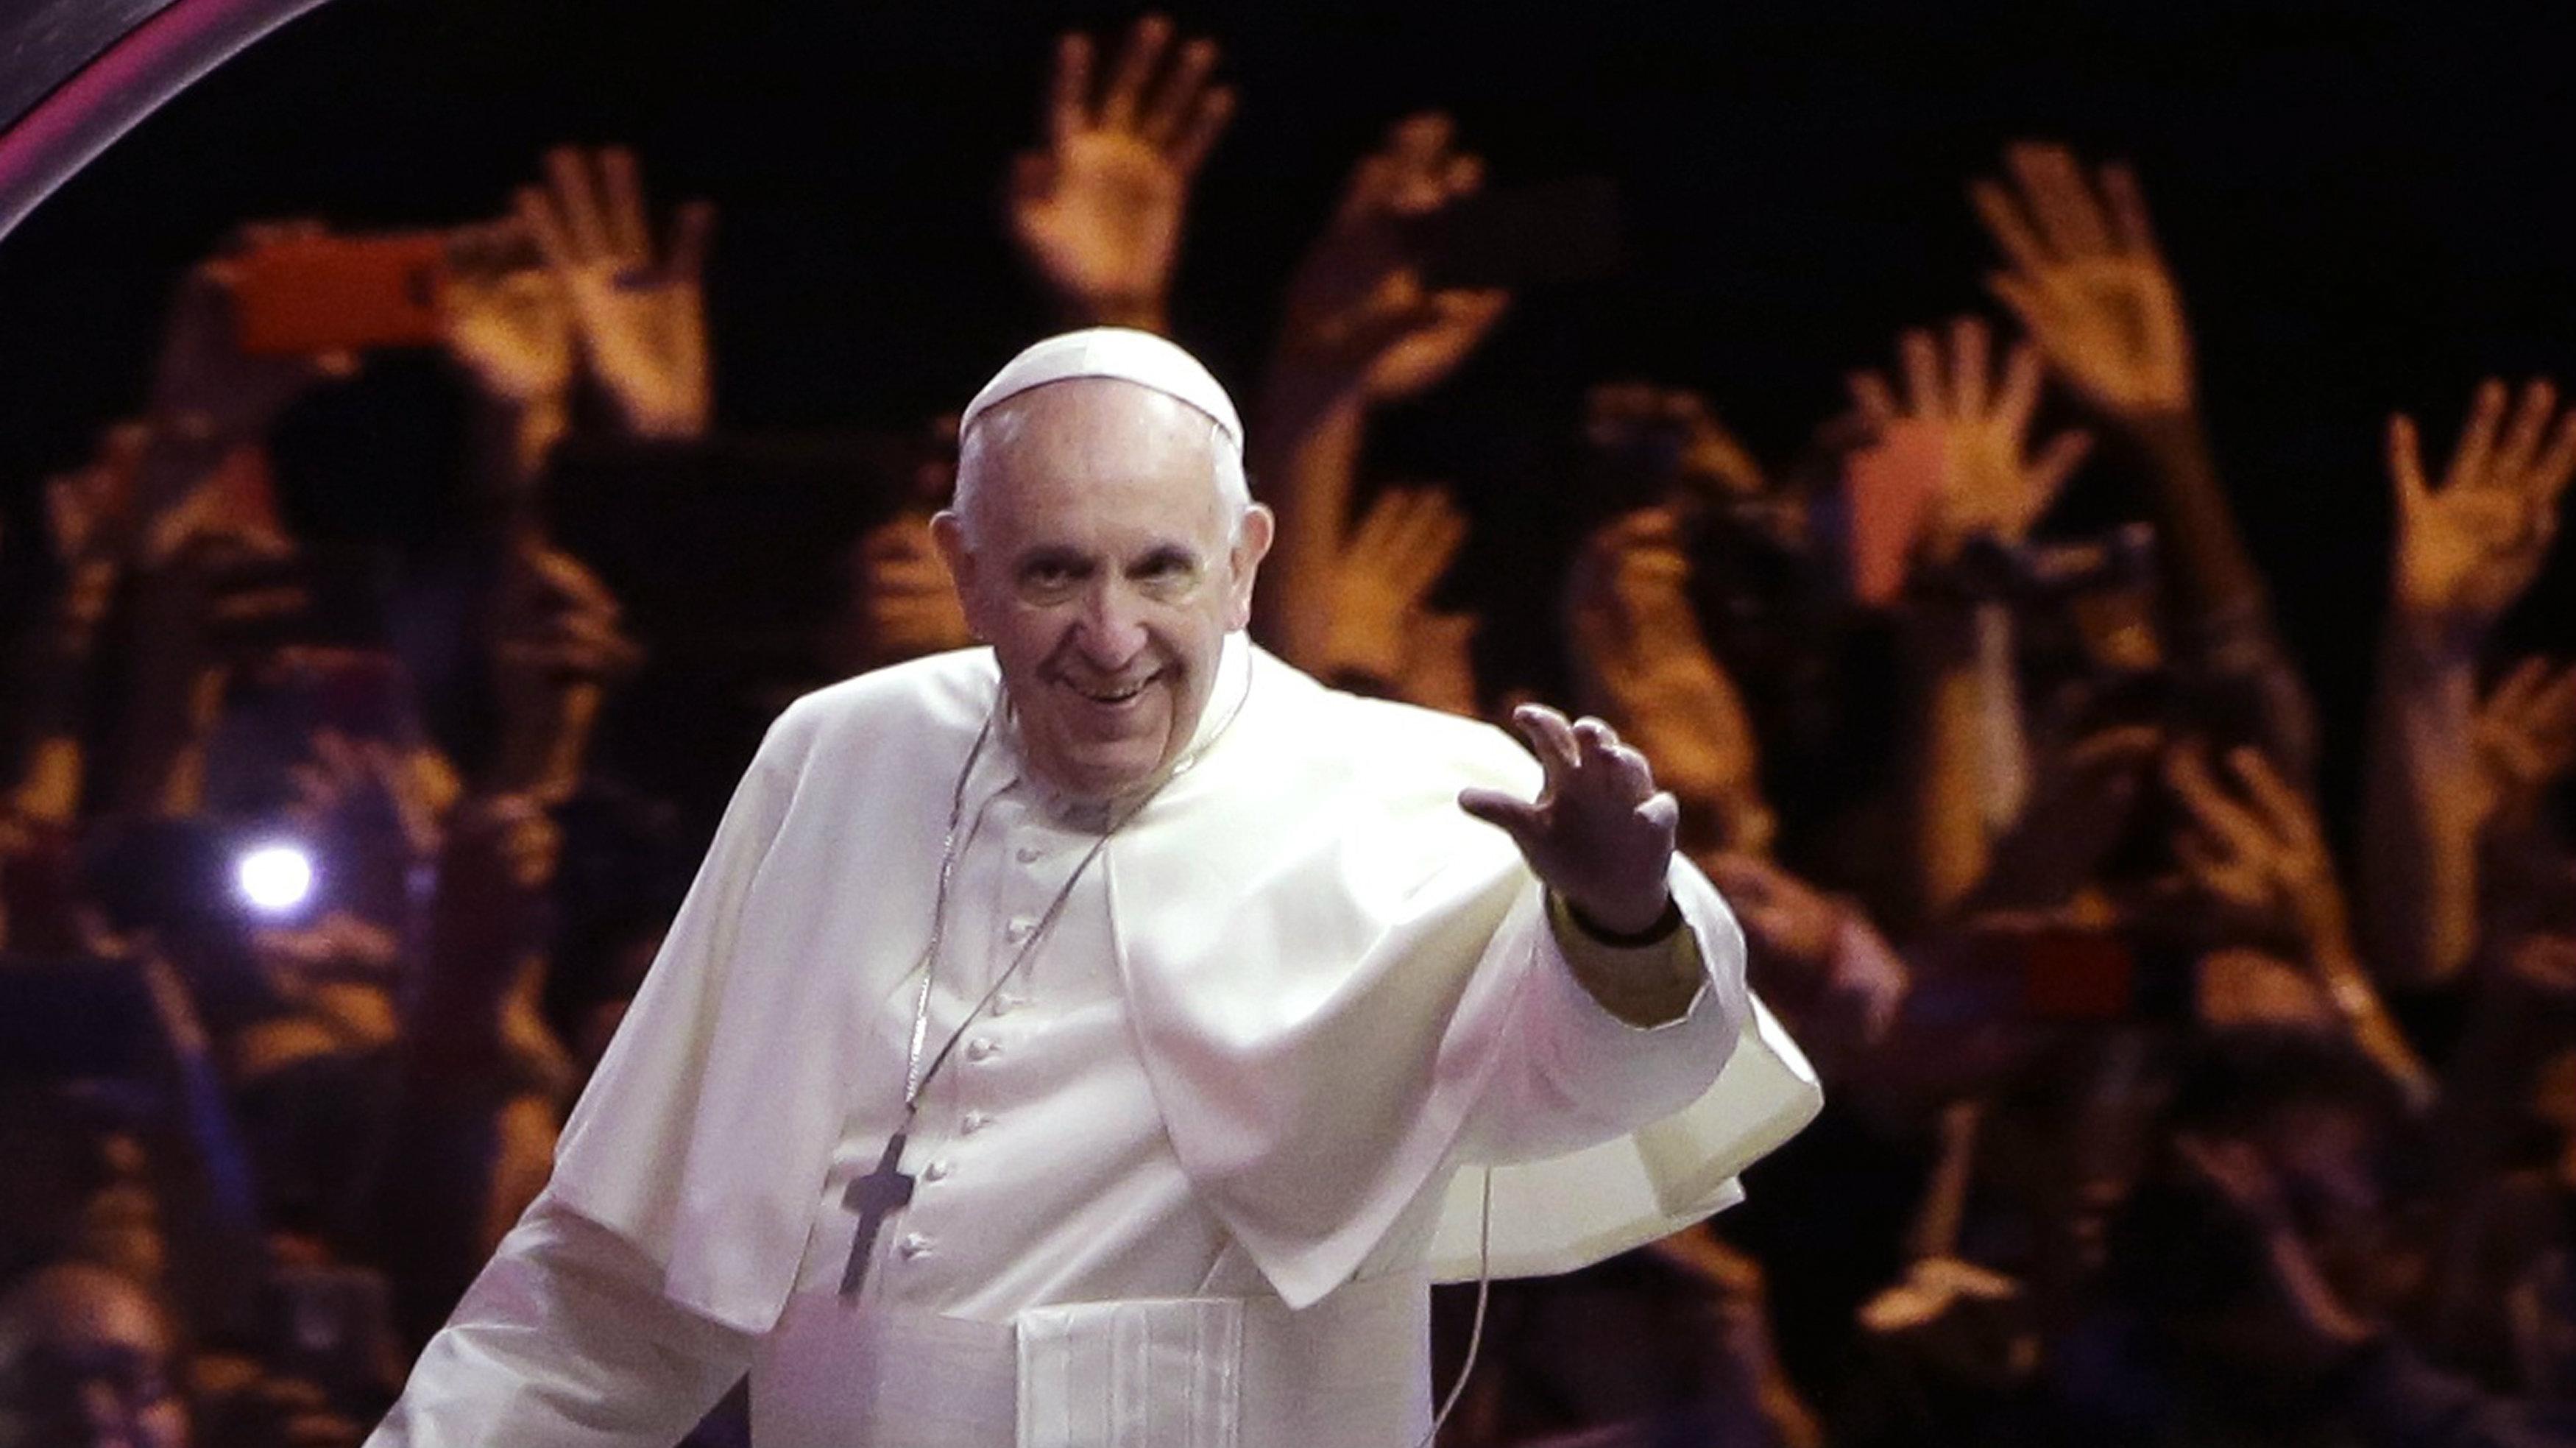 Pope Francis waves from his popemobile in Philadelphia September 26, 2015.